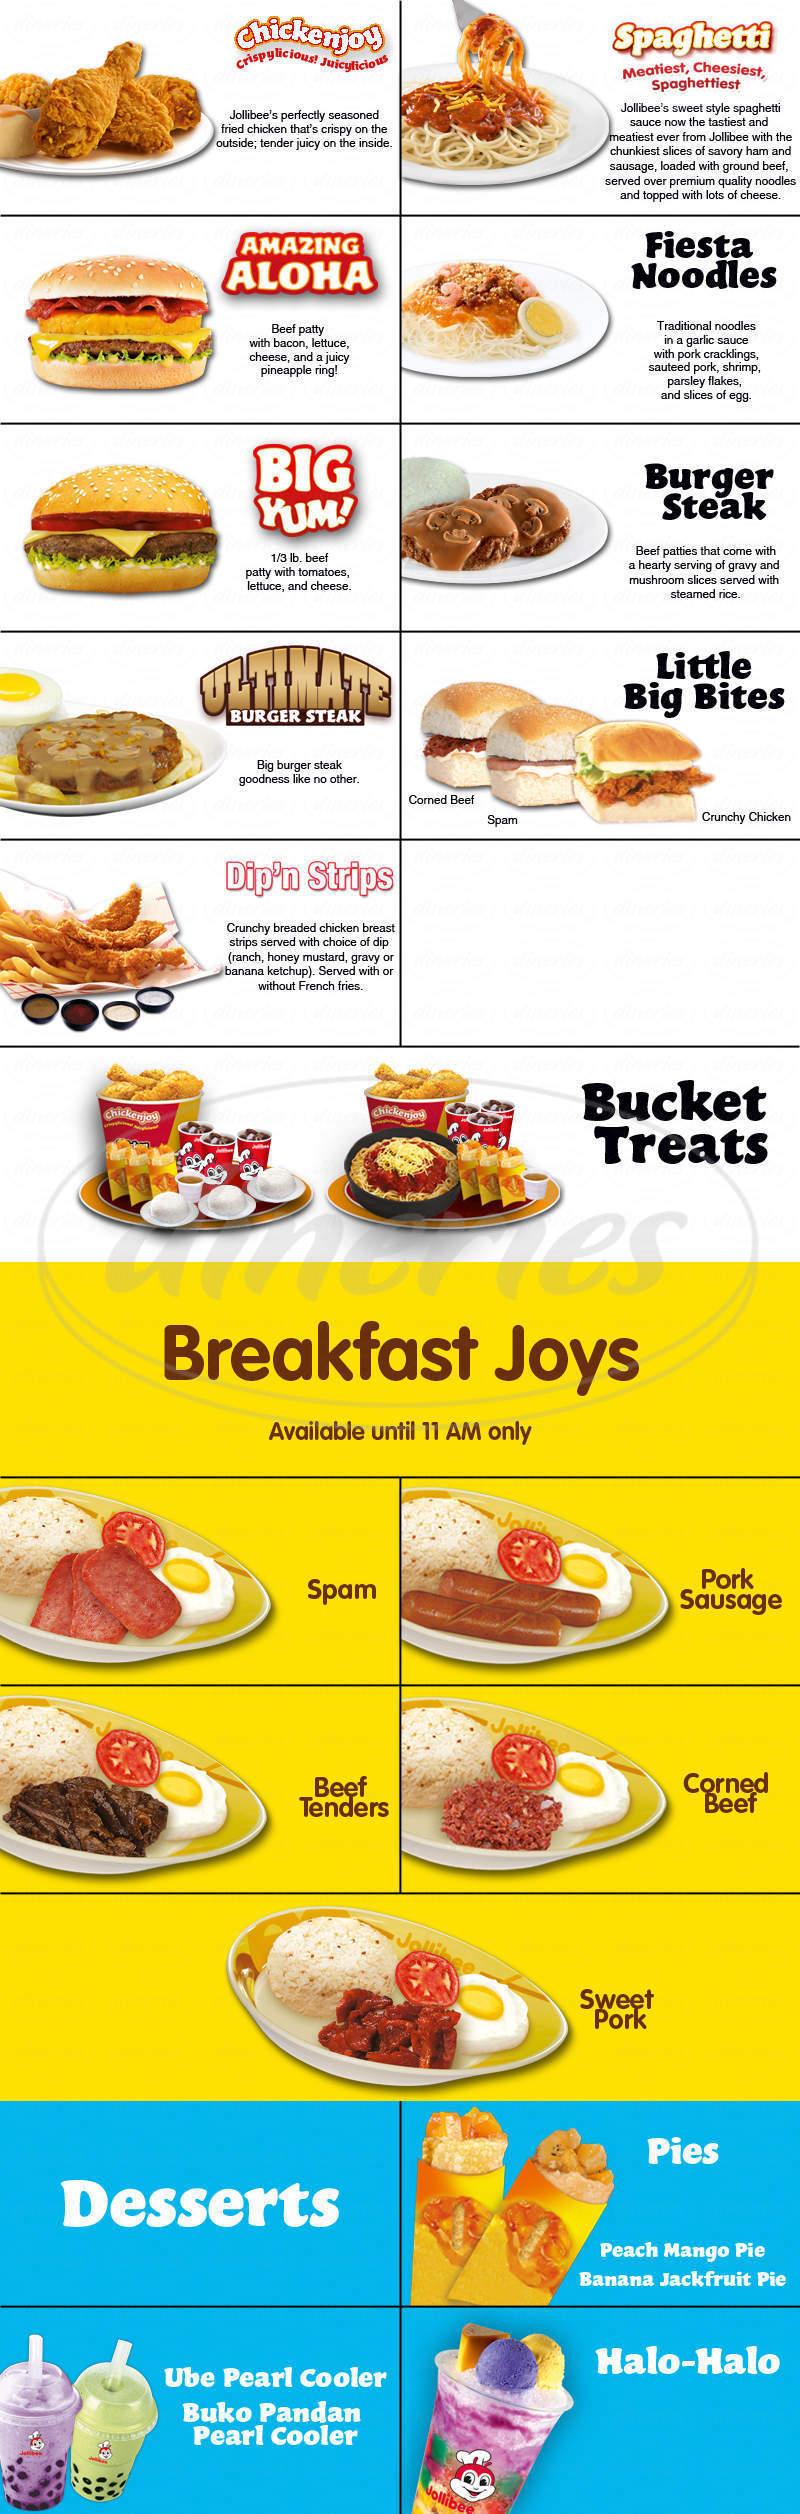 menu for Jollibee